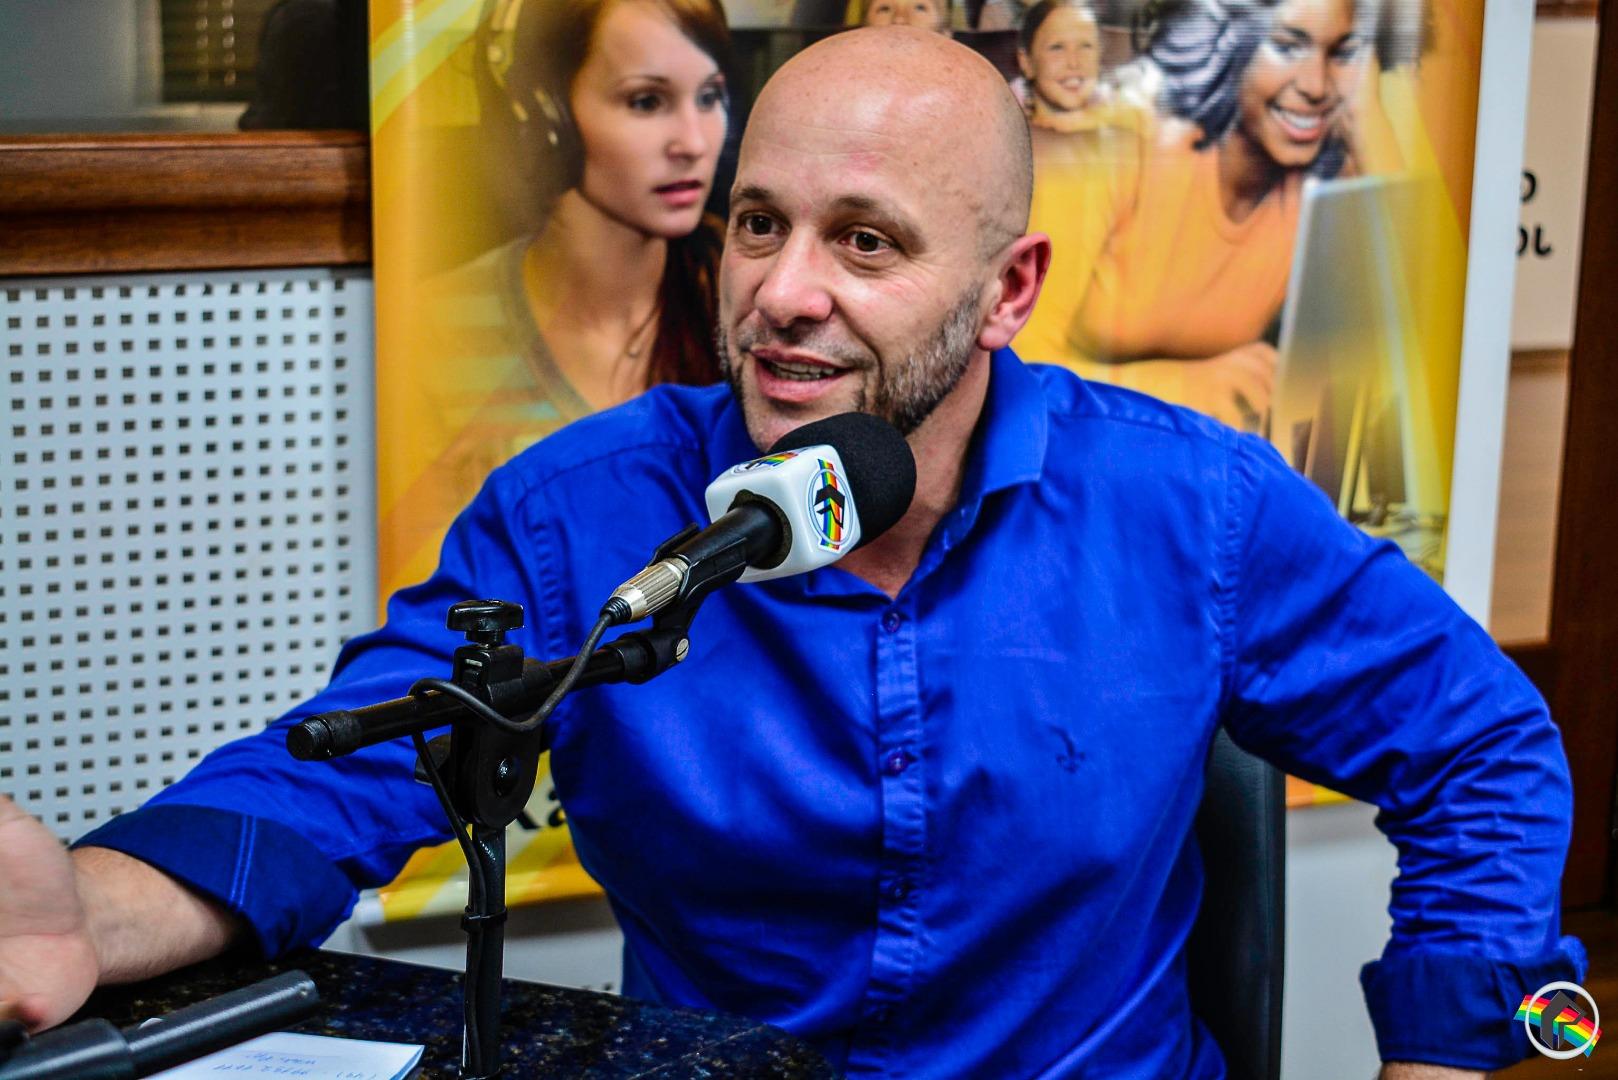 Professor Douglas apresenta empresa que agencia atletas